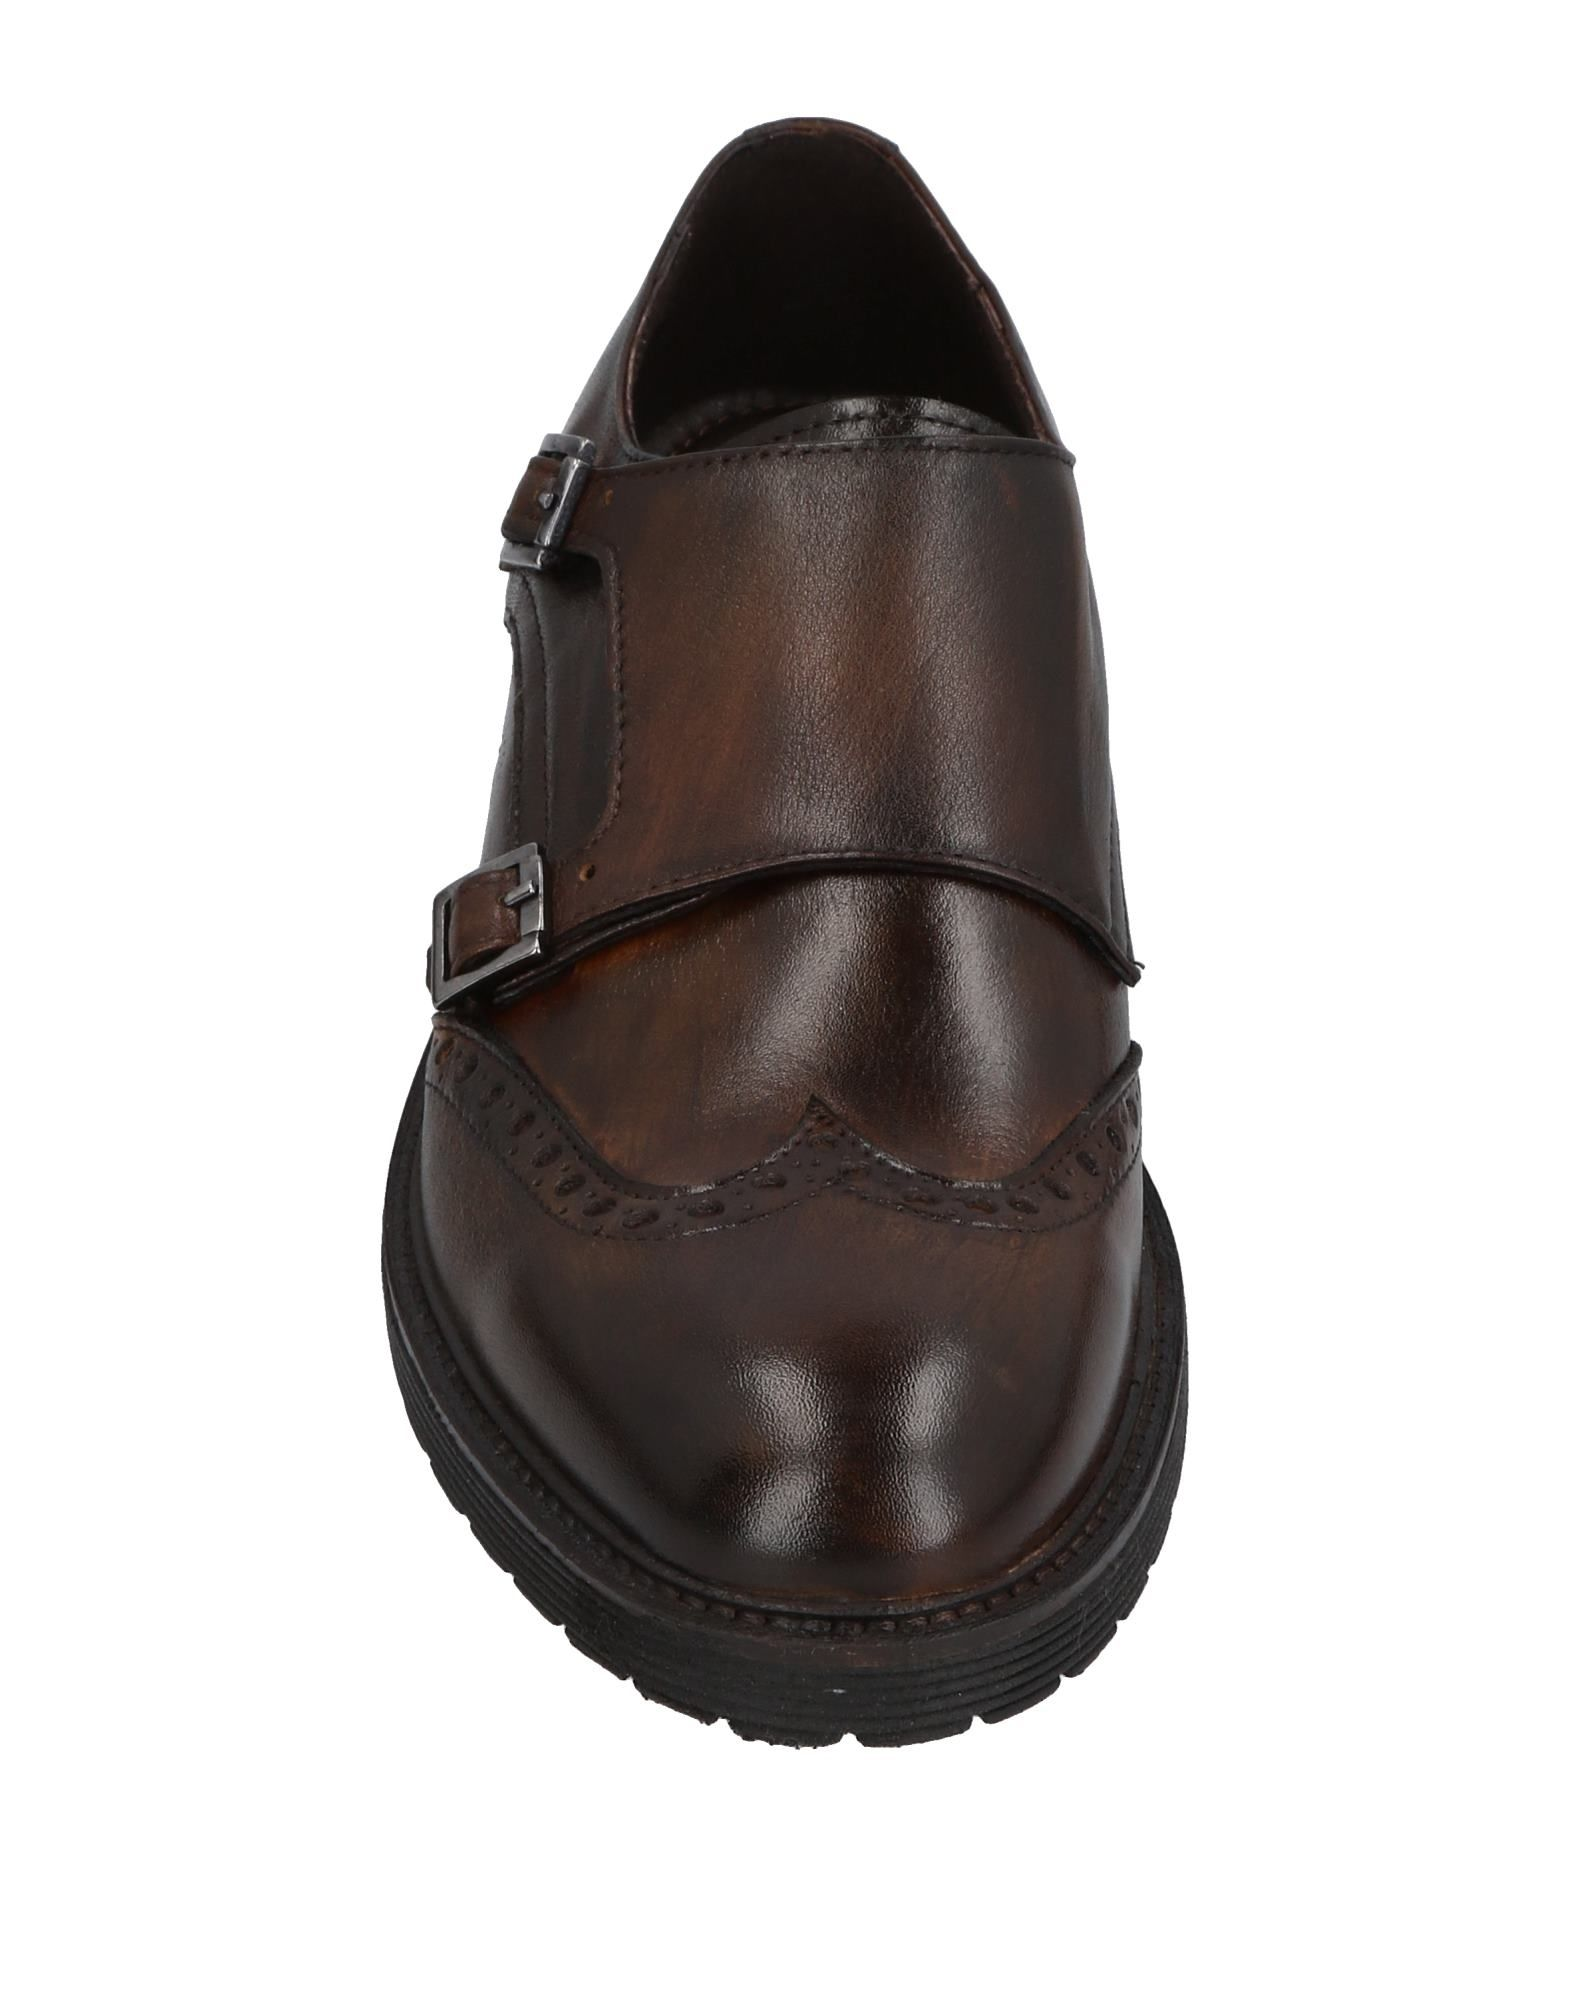 Rabatt echte Schuhe Schuhe echte Herman & Sons Mokassins Herren  11452834MK 5c3d5f